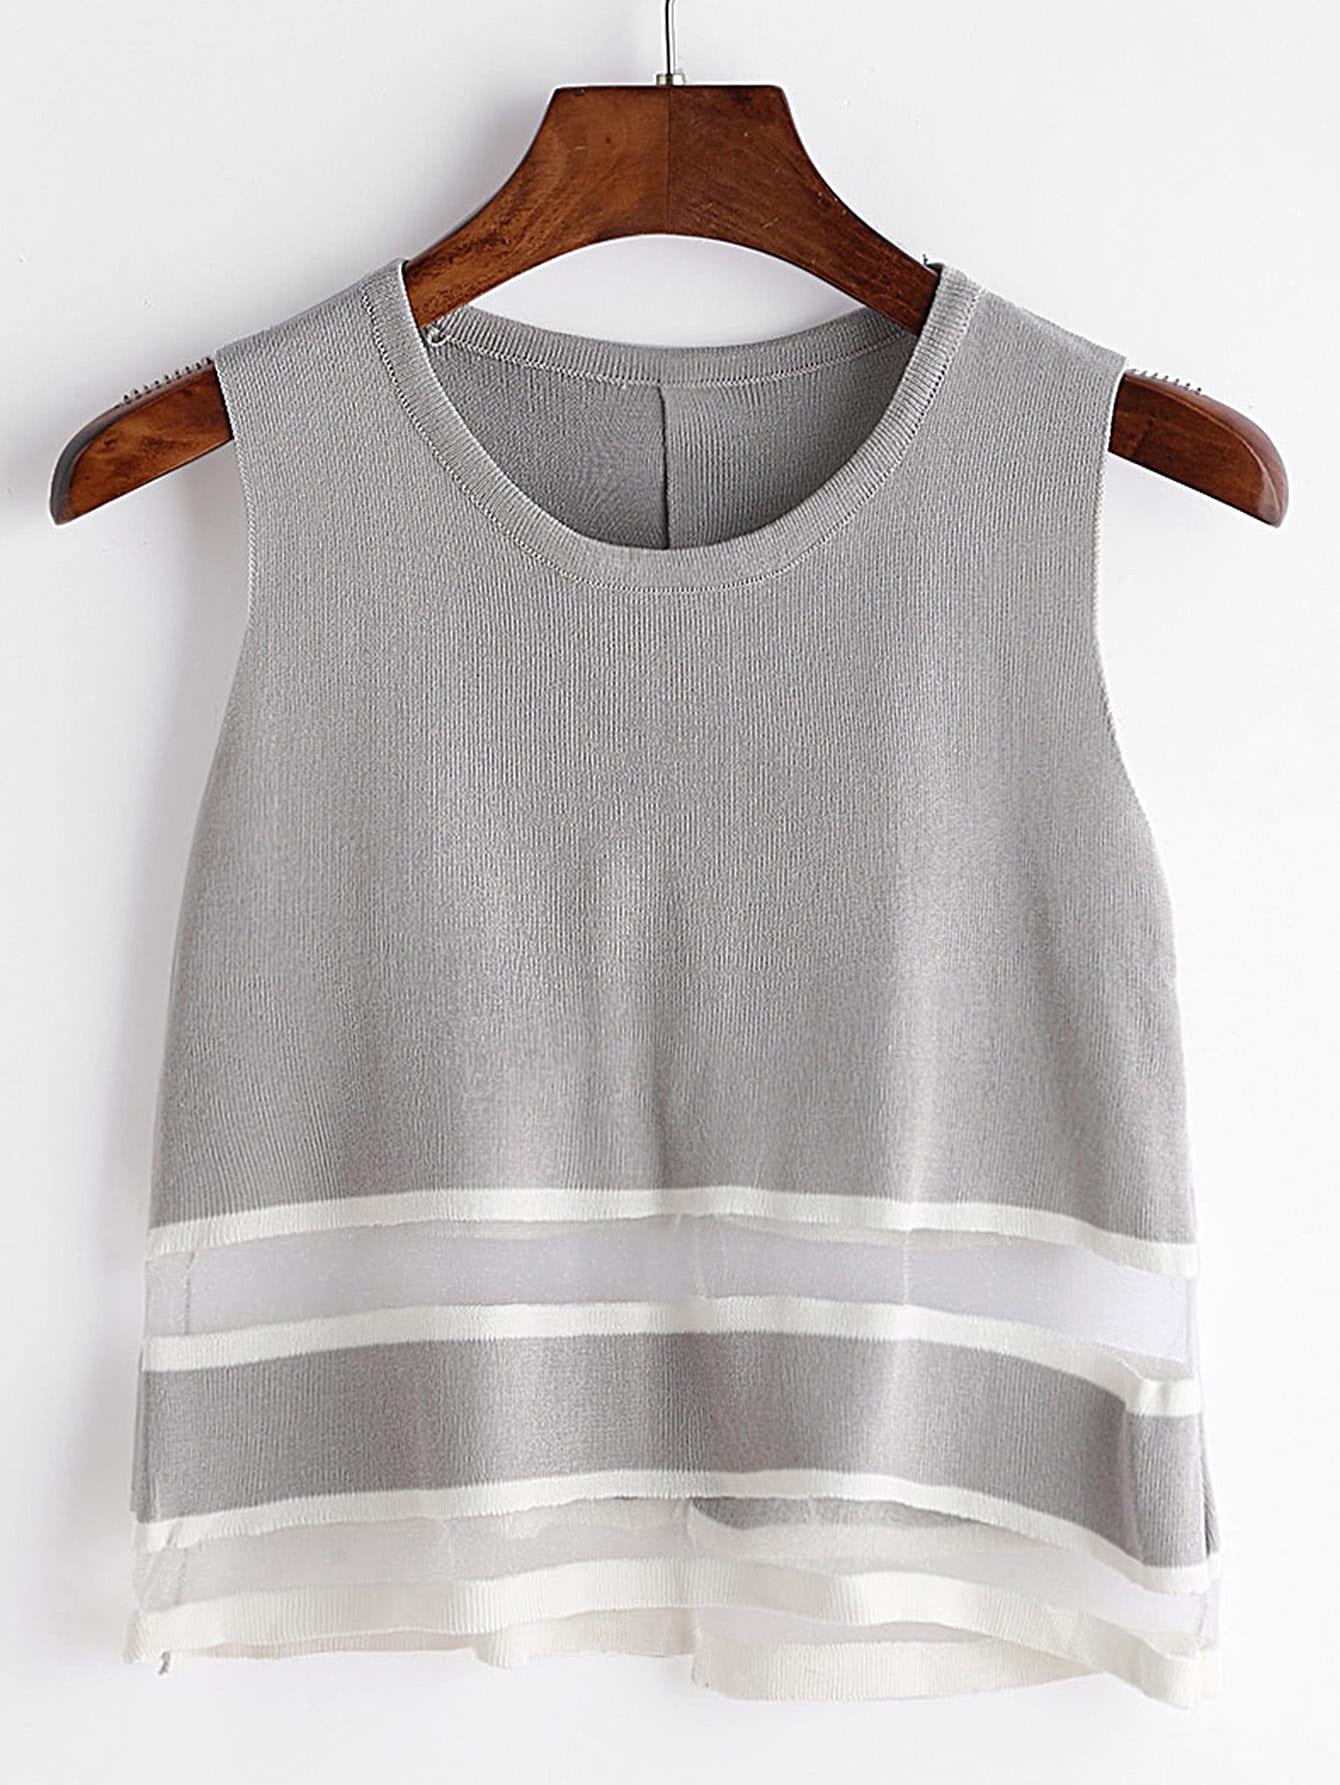 Grey Sheer Mesh Insert Slit Back Knit Tank Top vest170322002